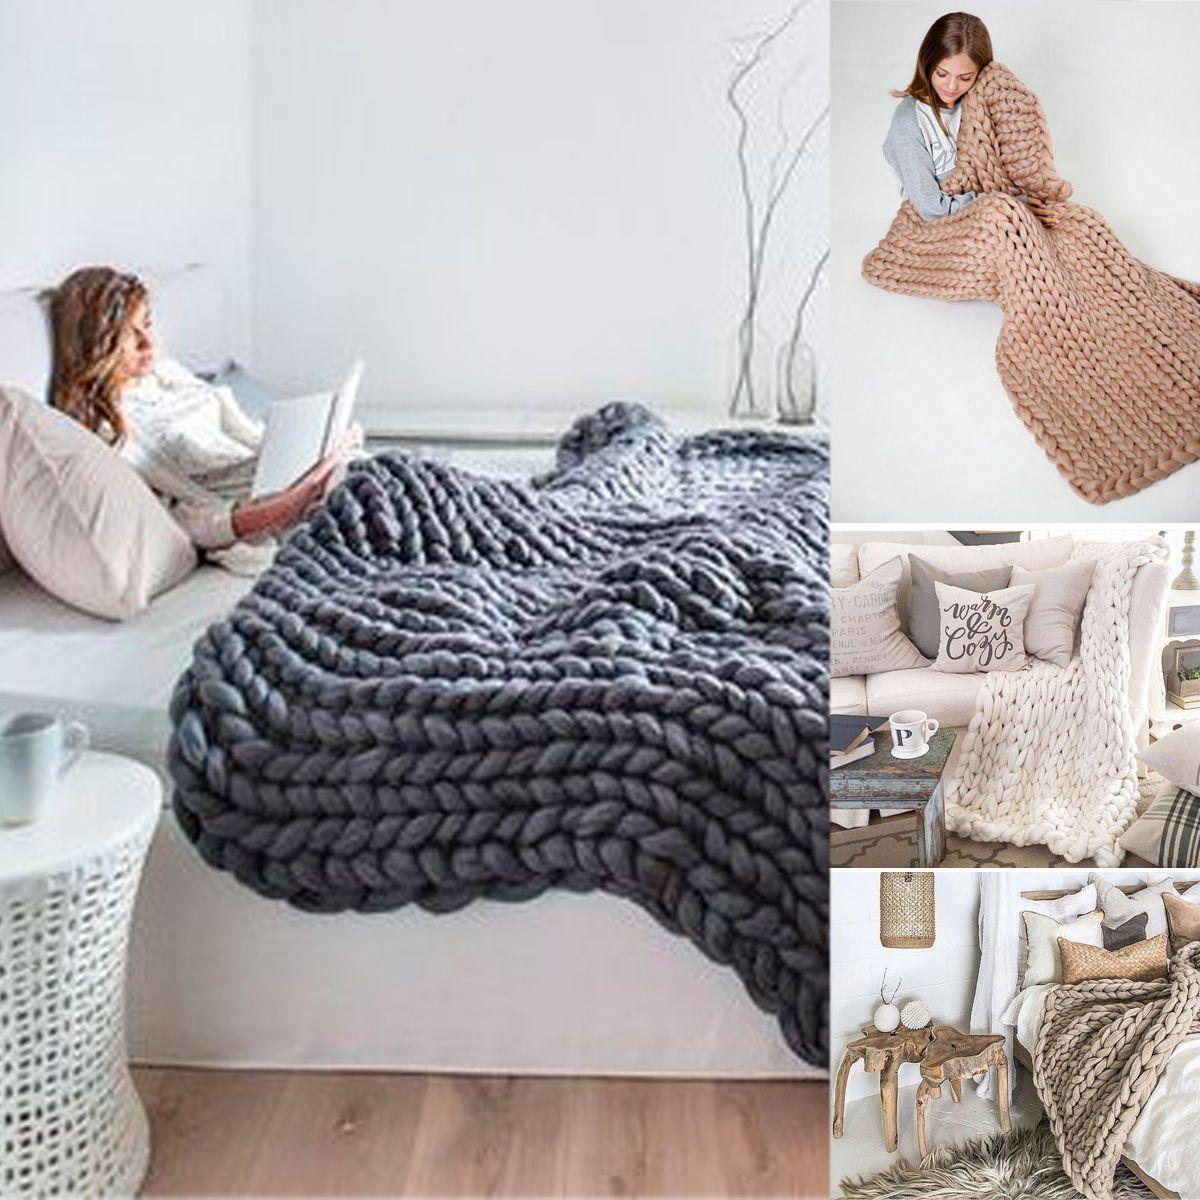 Home Blanket, Knitted blankets, Soft blankets